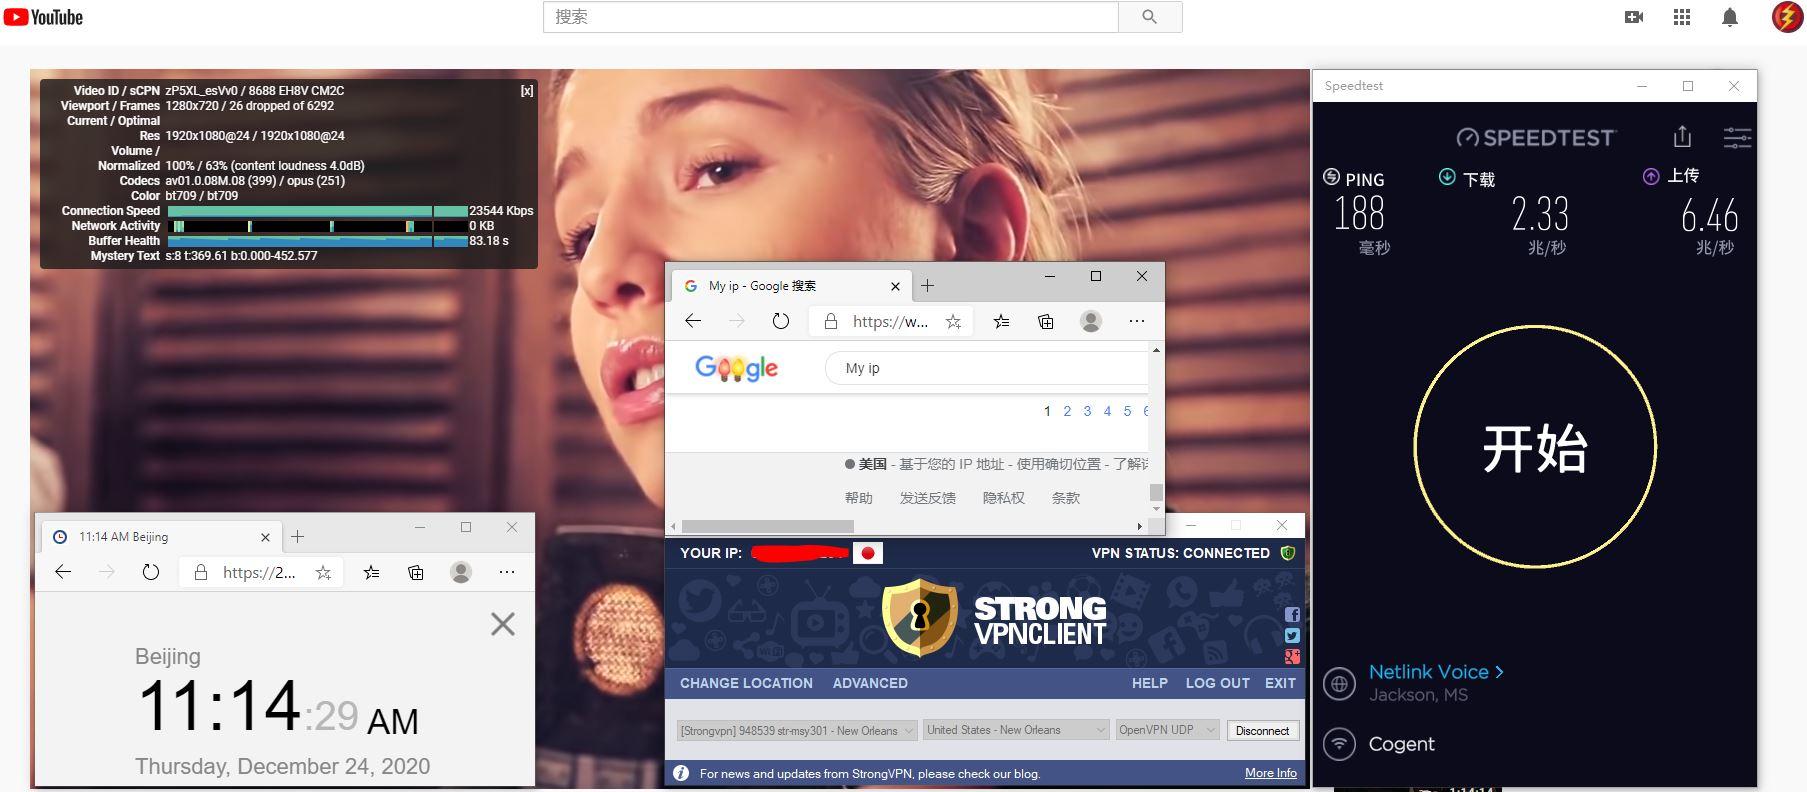 Windows10 StrongVPN USA - New Orleans 服务器 中国VPN 翻墙 科学上网 测试 - 20201224